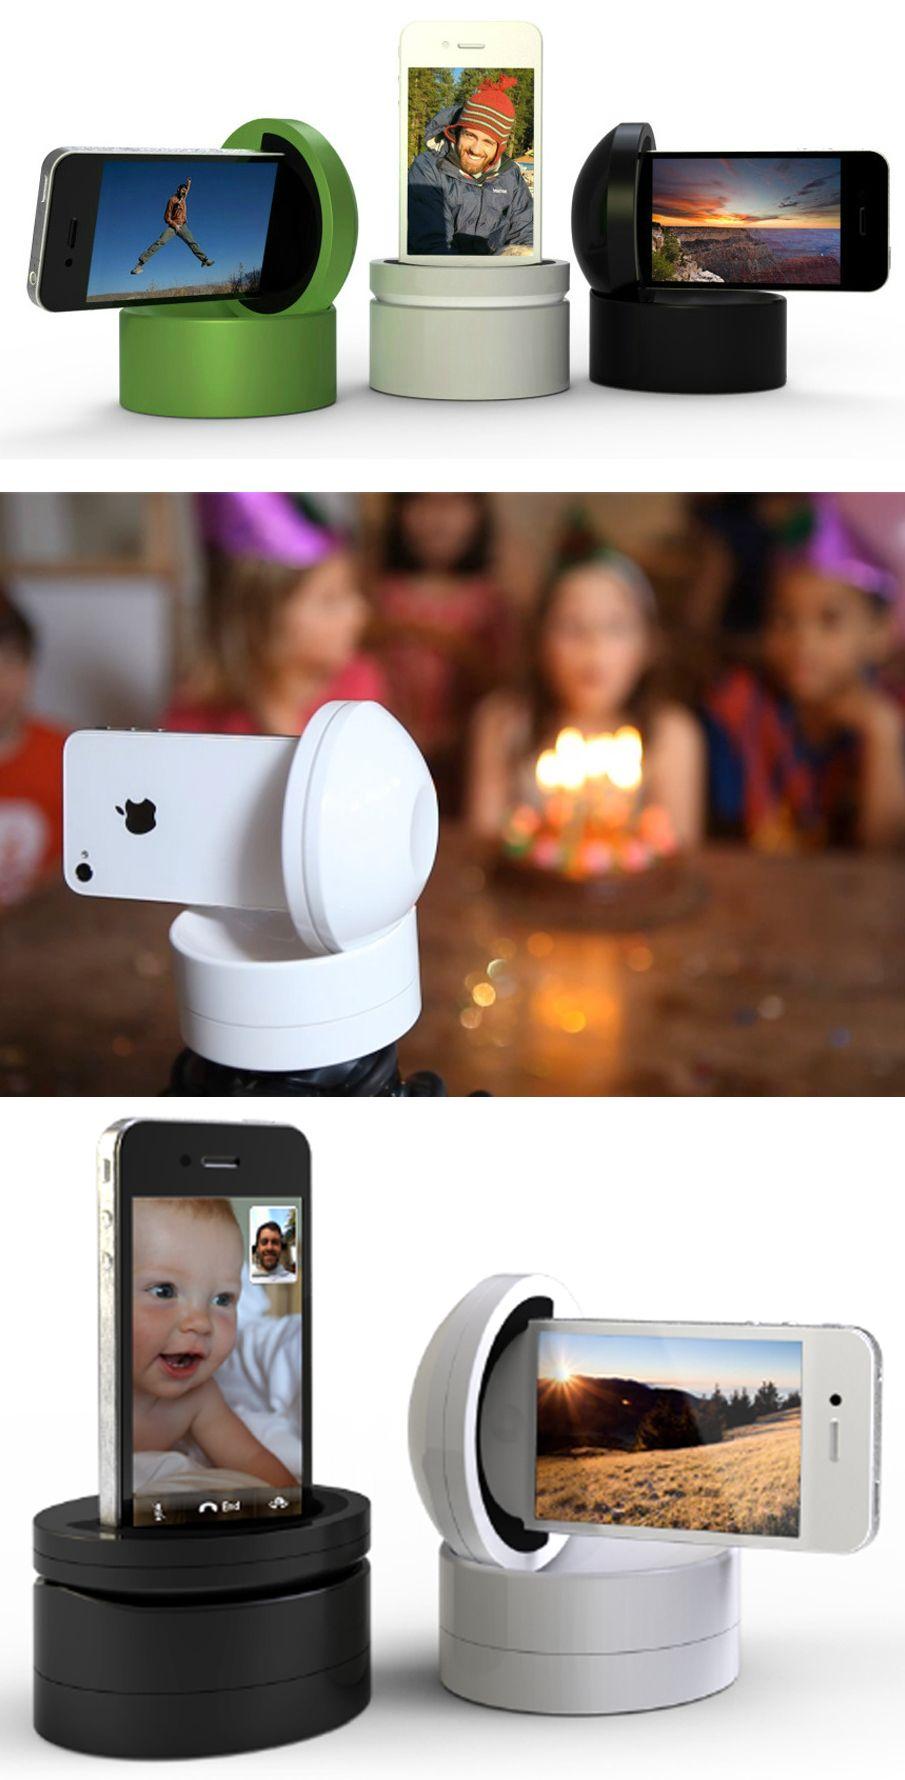 NextGen iPhone Dock Offers Robotic Motion, Exciting